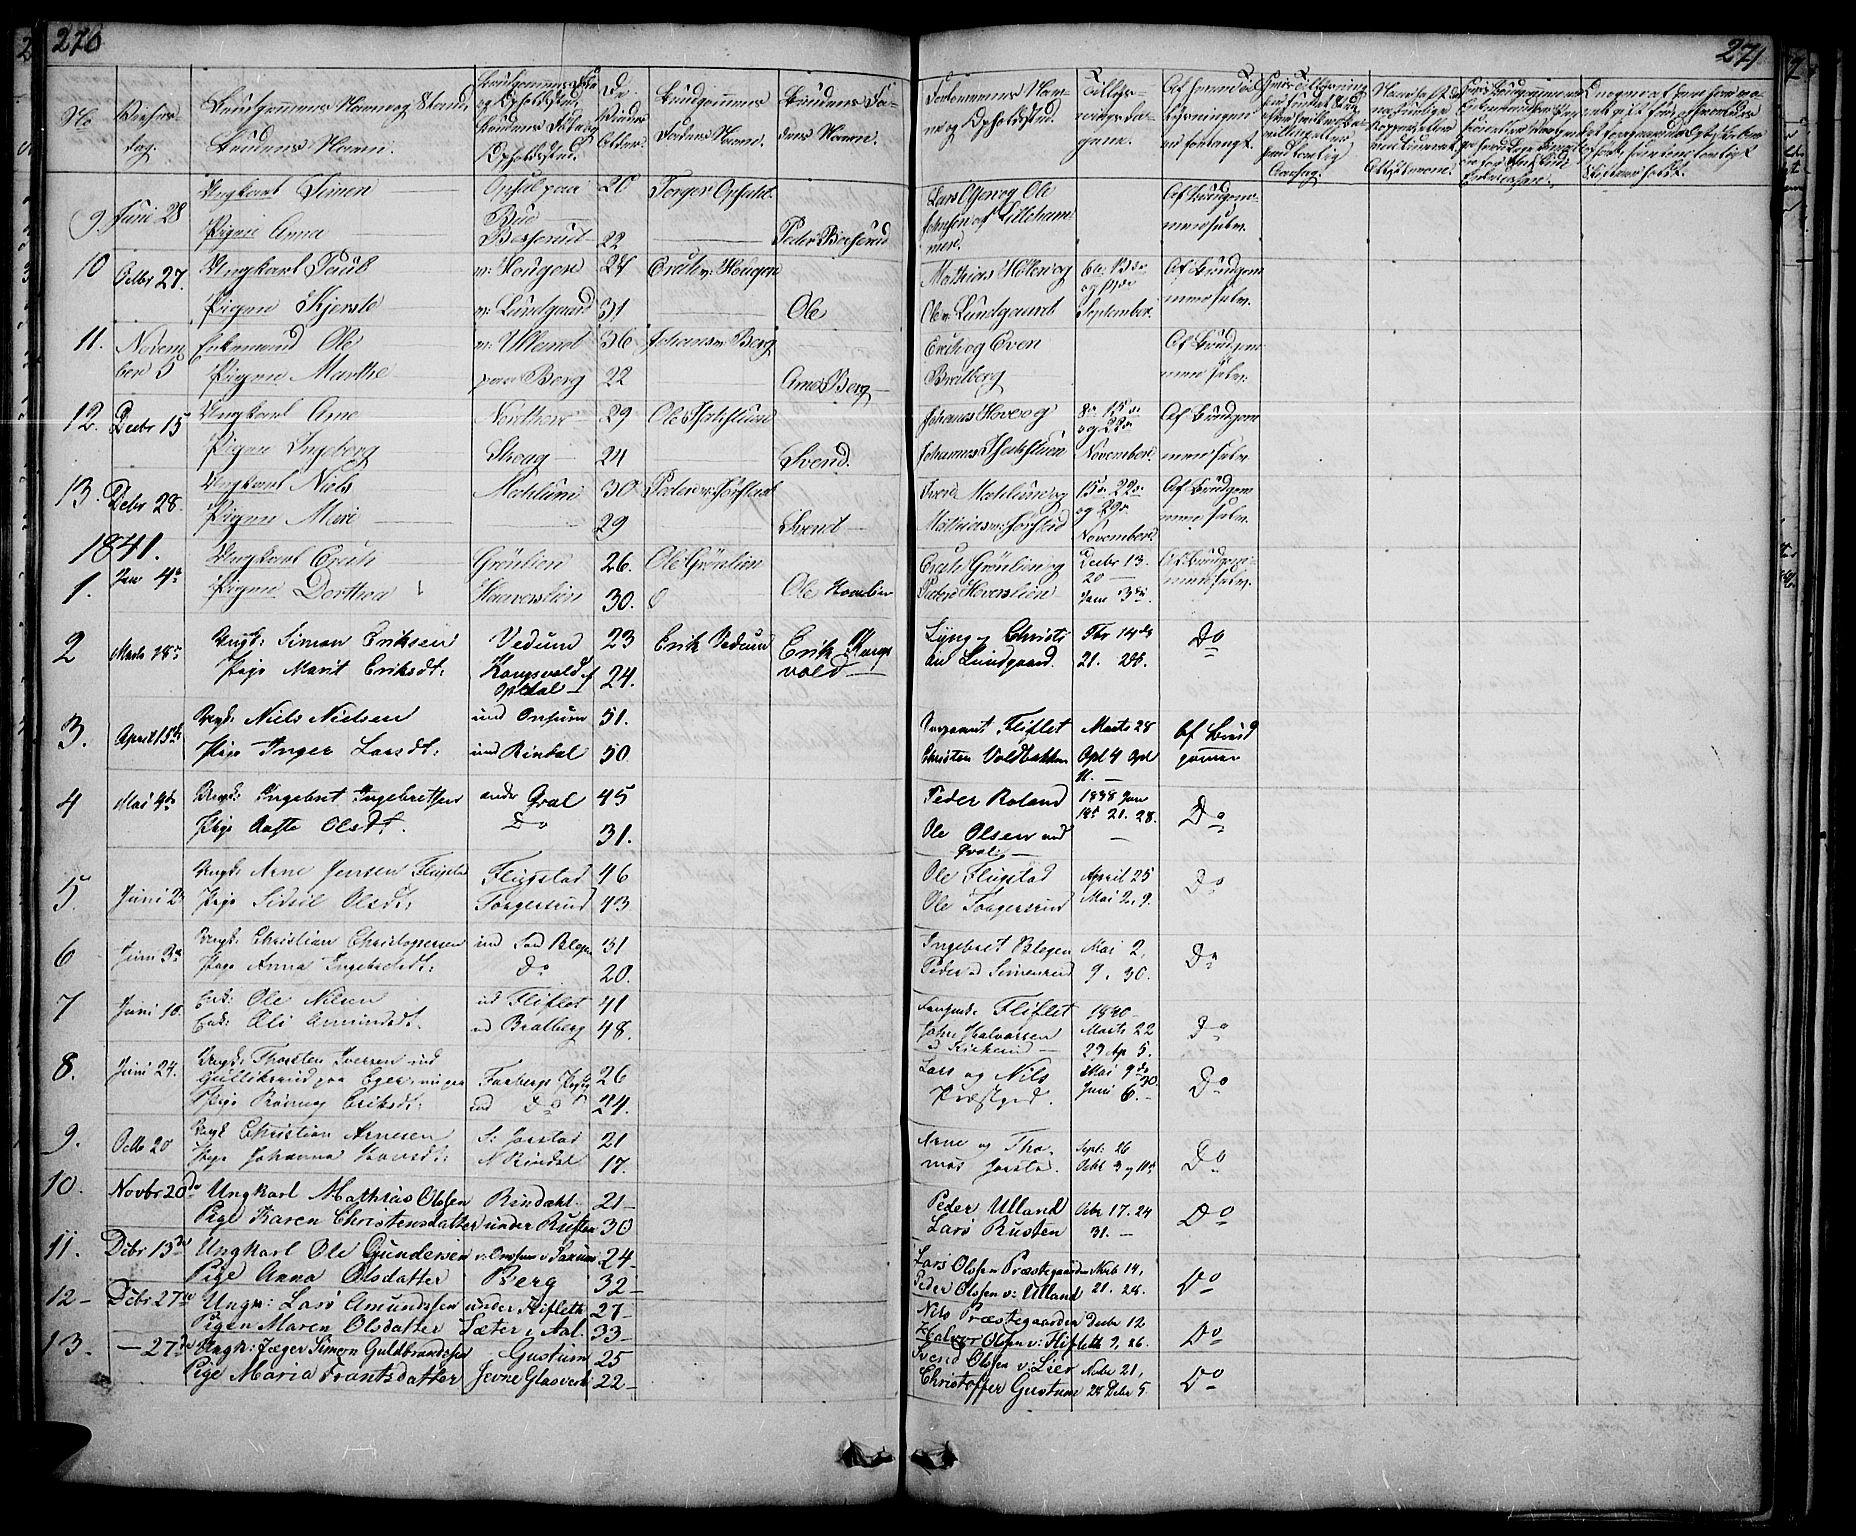 SAH, Fåberg prestekontor, Klokkerbok nr. 5, 1837-1864, s. 270-271